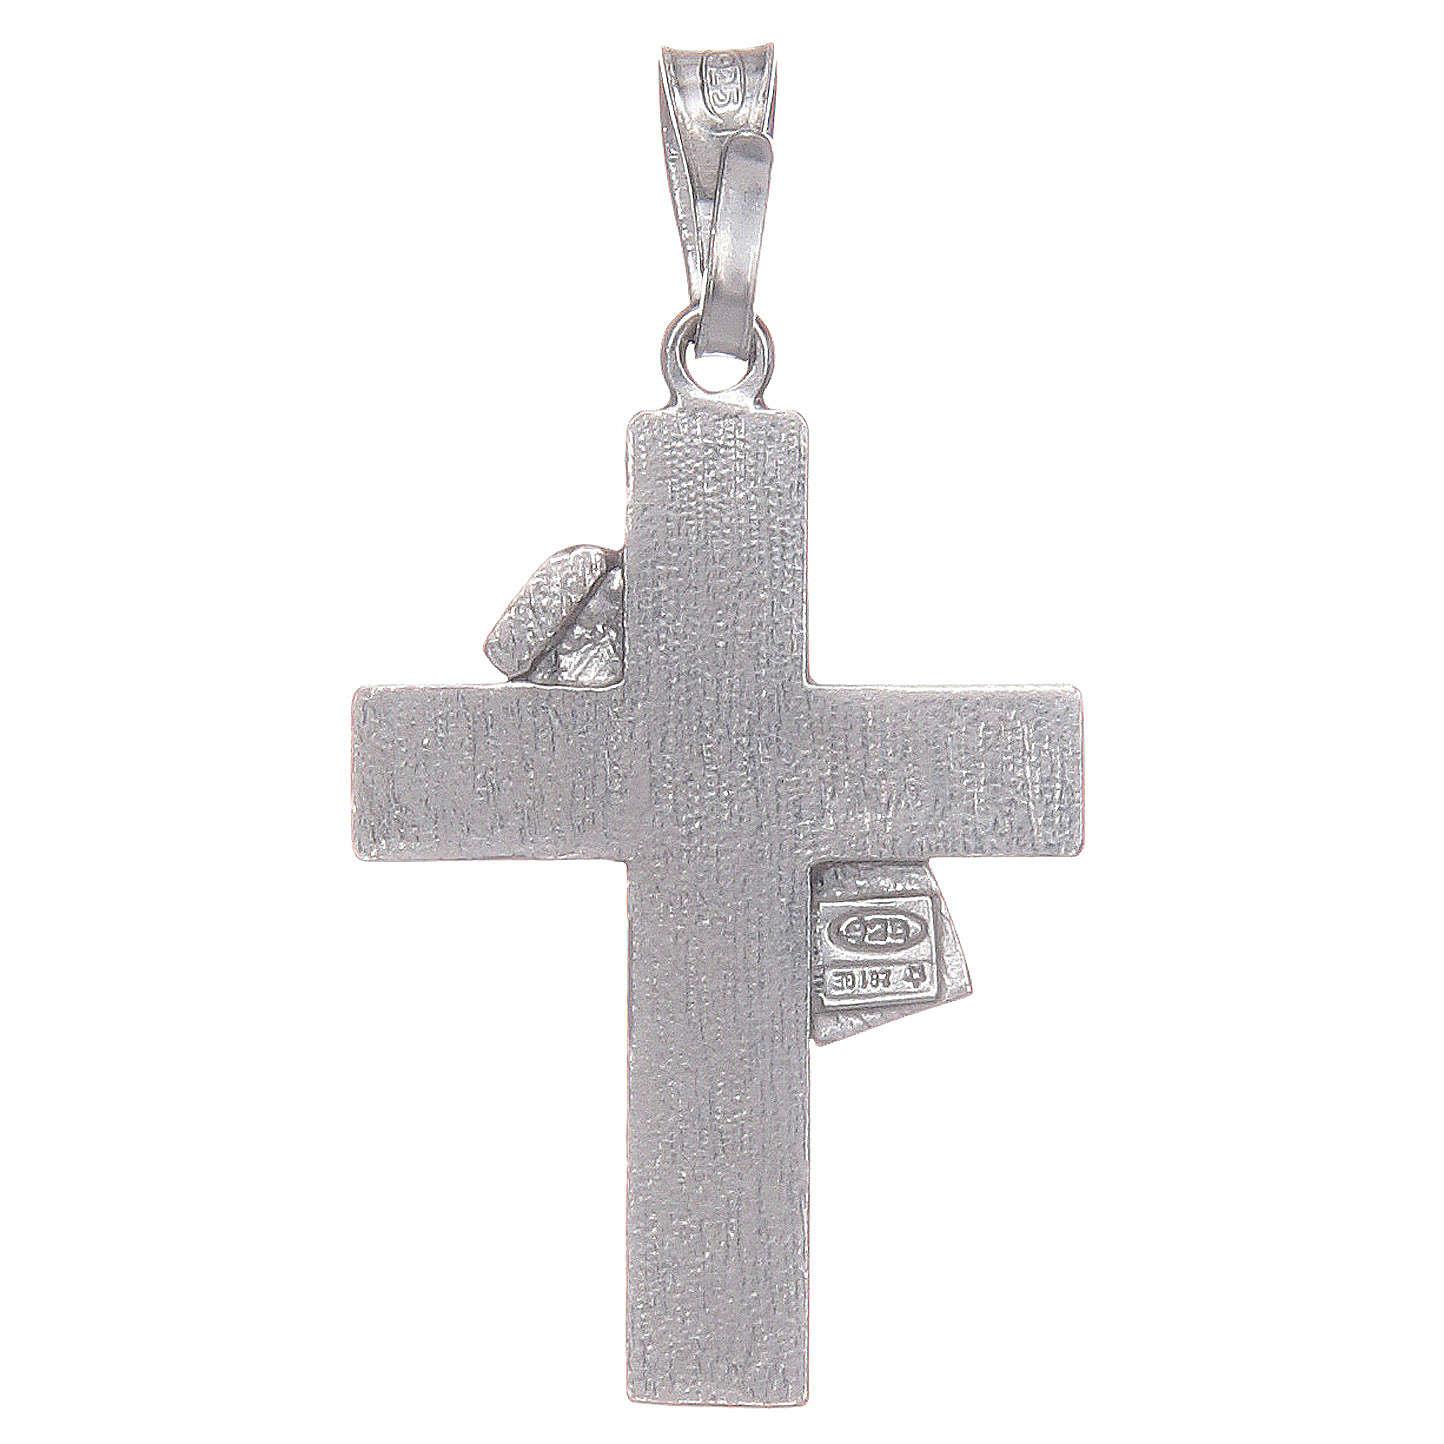 Croce diaconale argento 925 smalto rosso 4